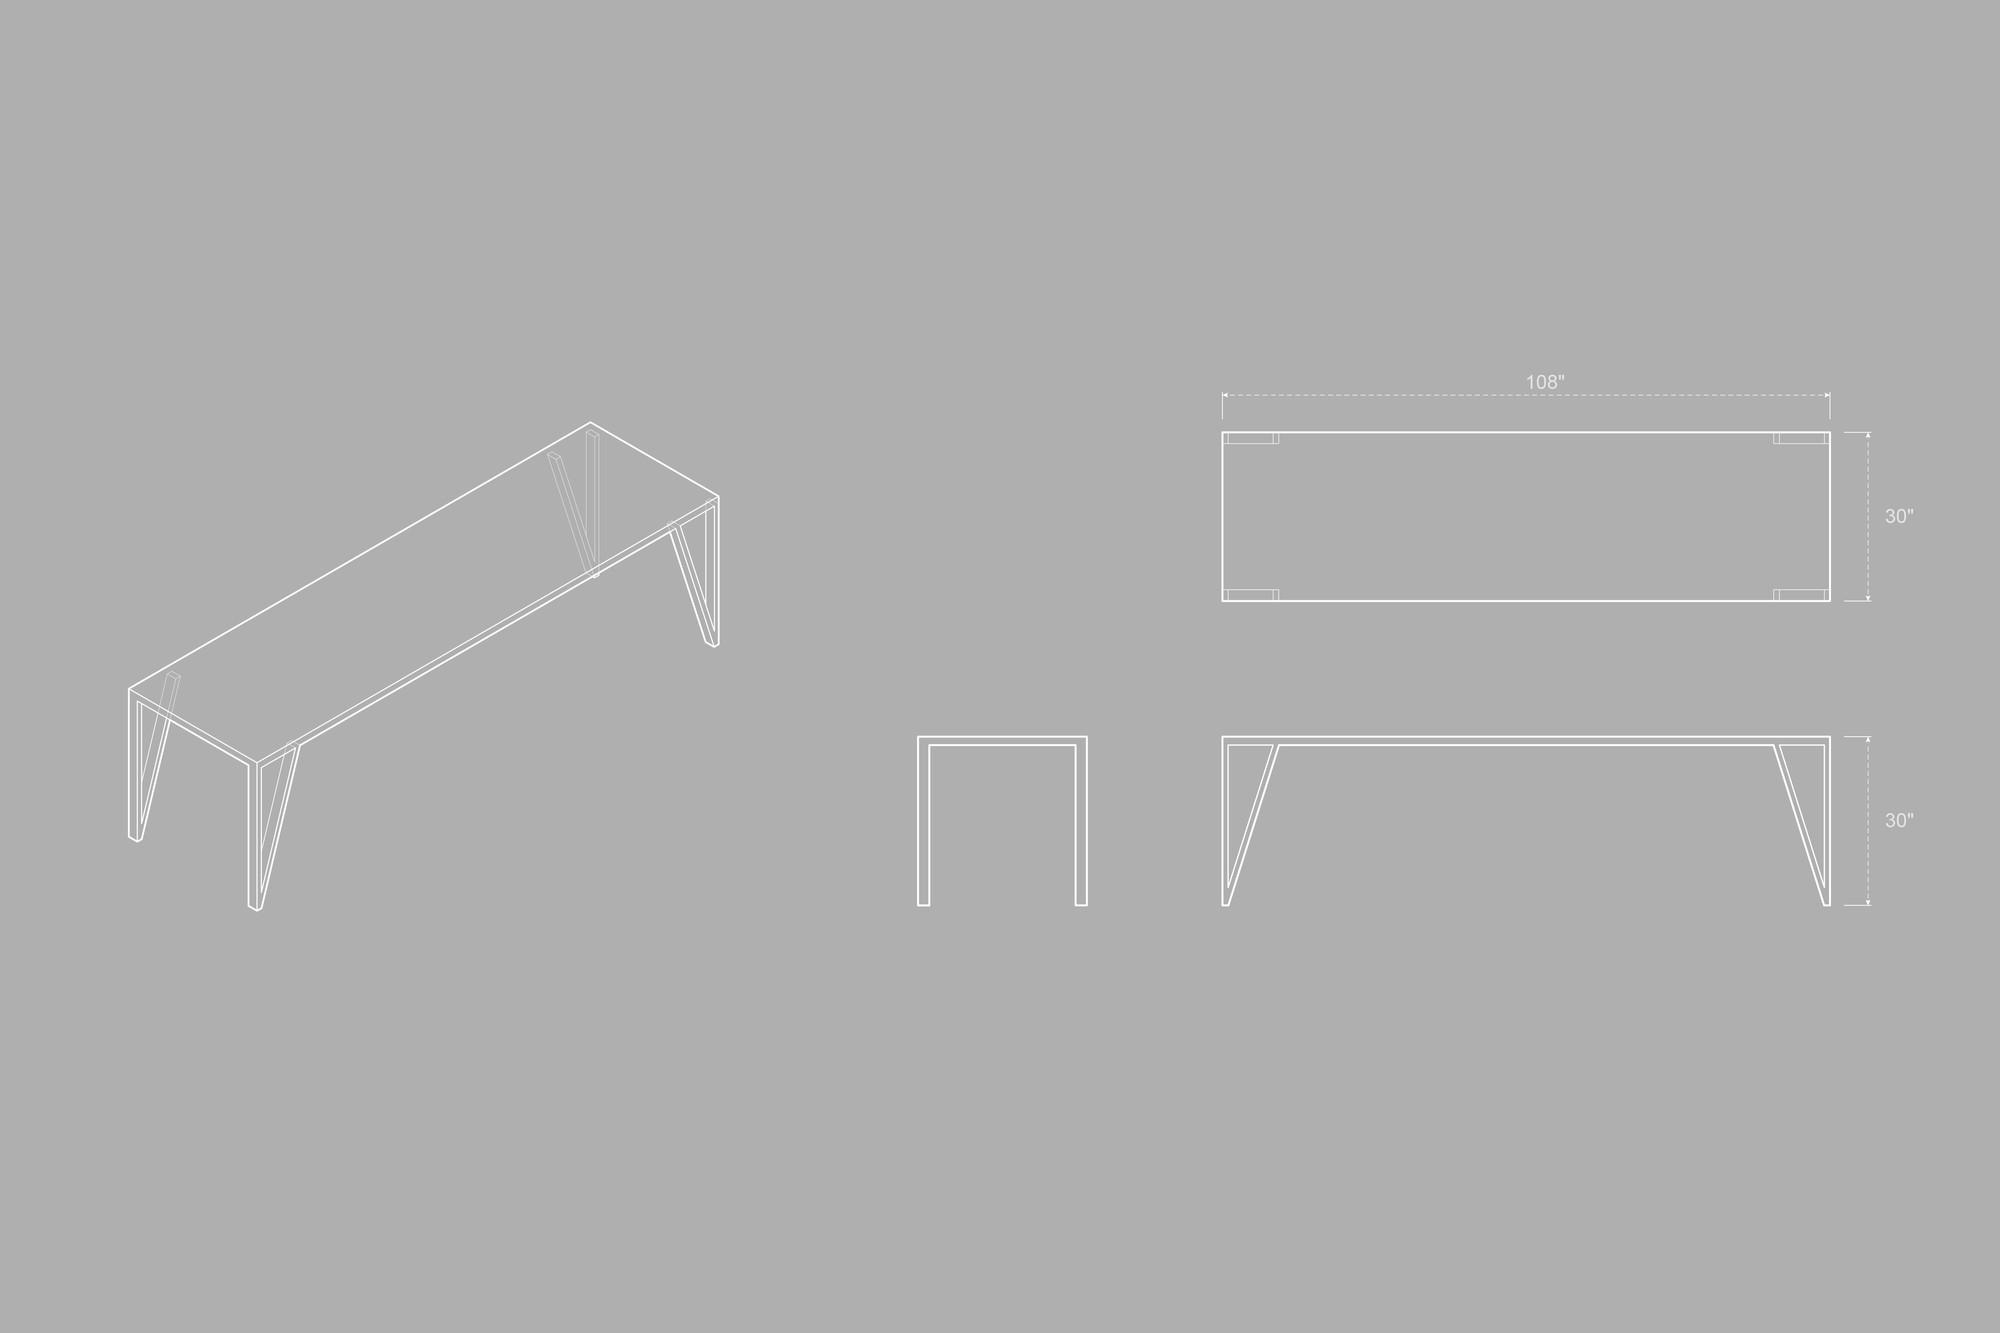 A.P.M_Dining-Table-Website-Diagram_White-1 strategic design consultancy